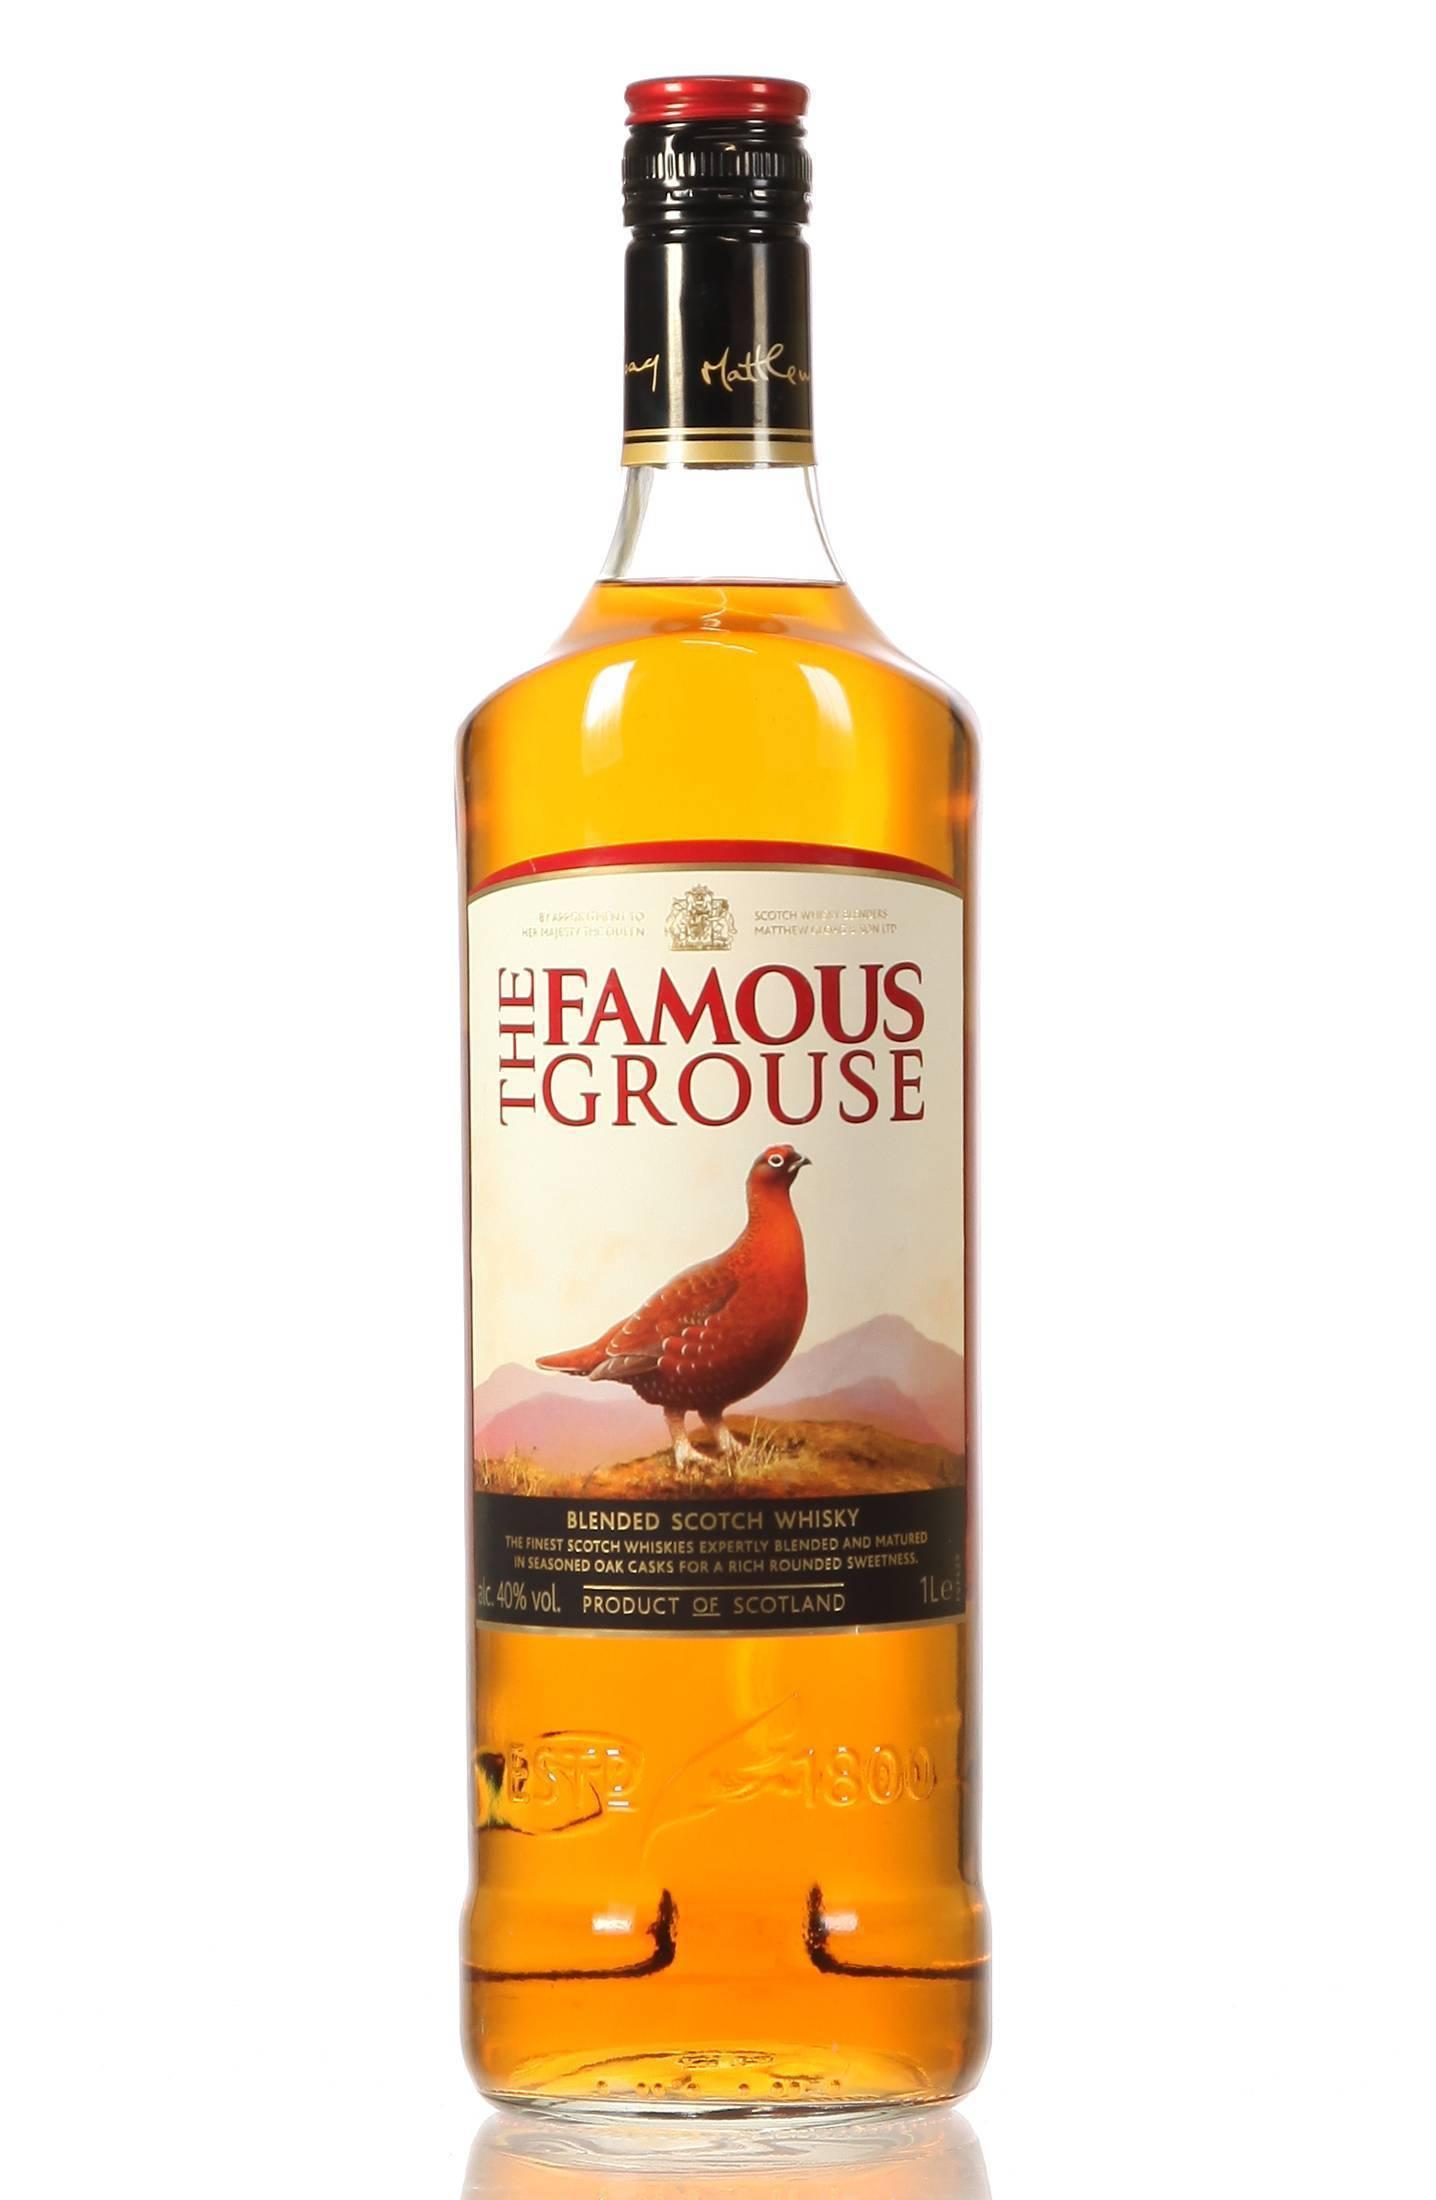 Famous grouse (фэймос граус или знаменитая куропатка)